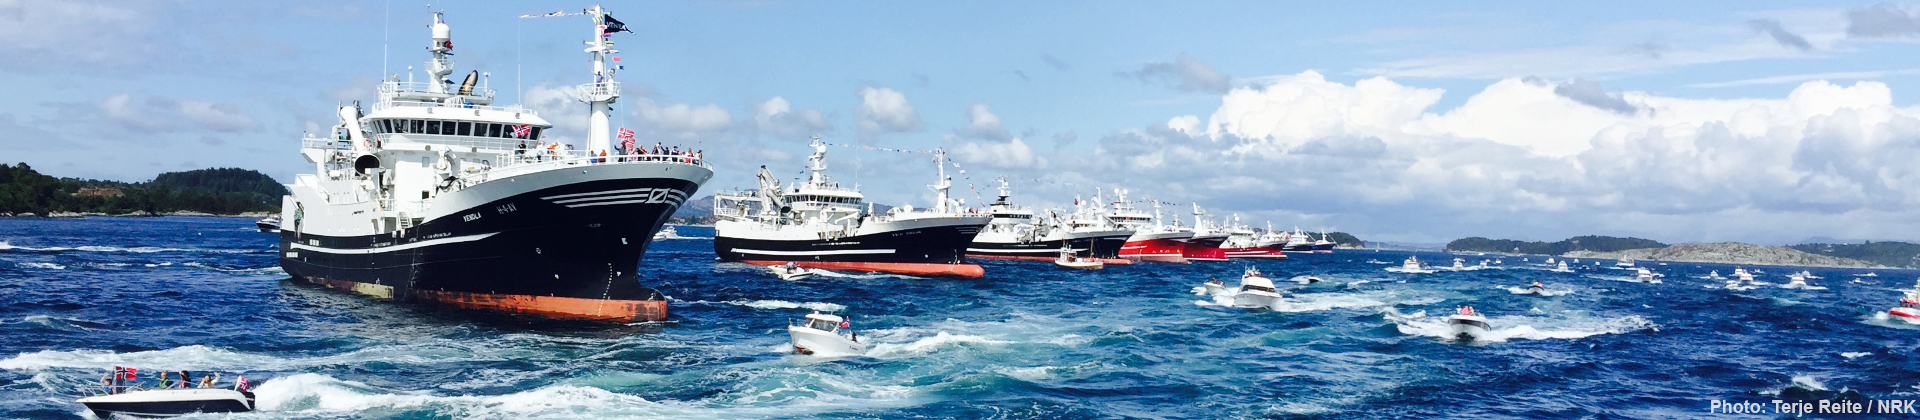 Fishing-vessels-Photo-Terje-Reite-NRK